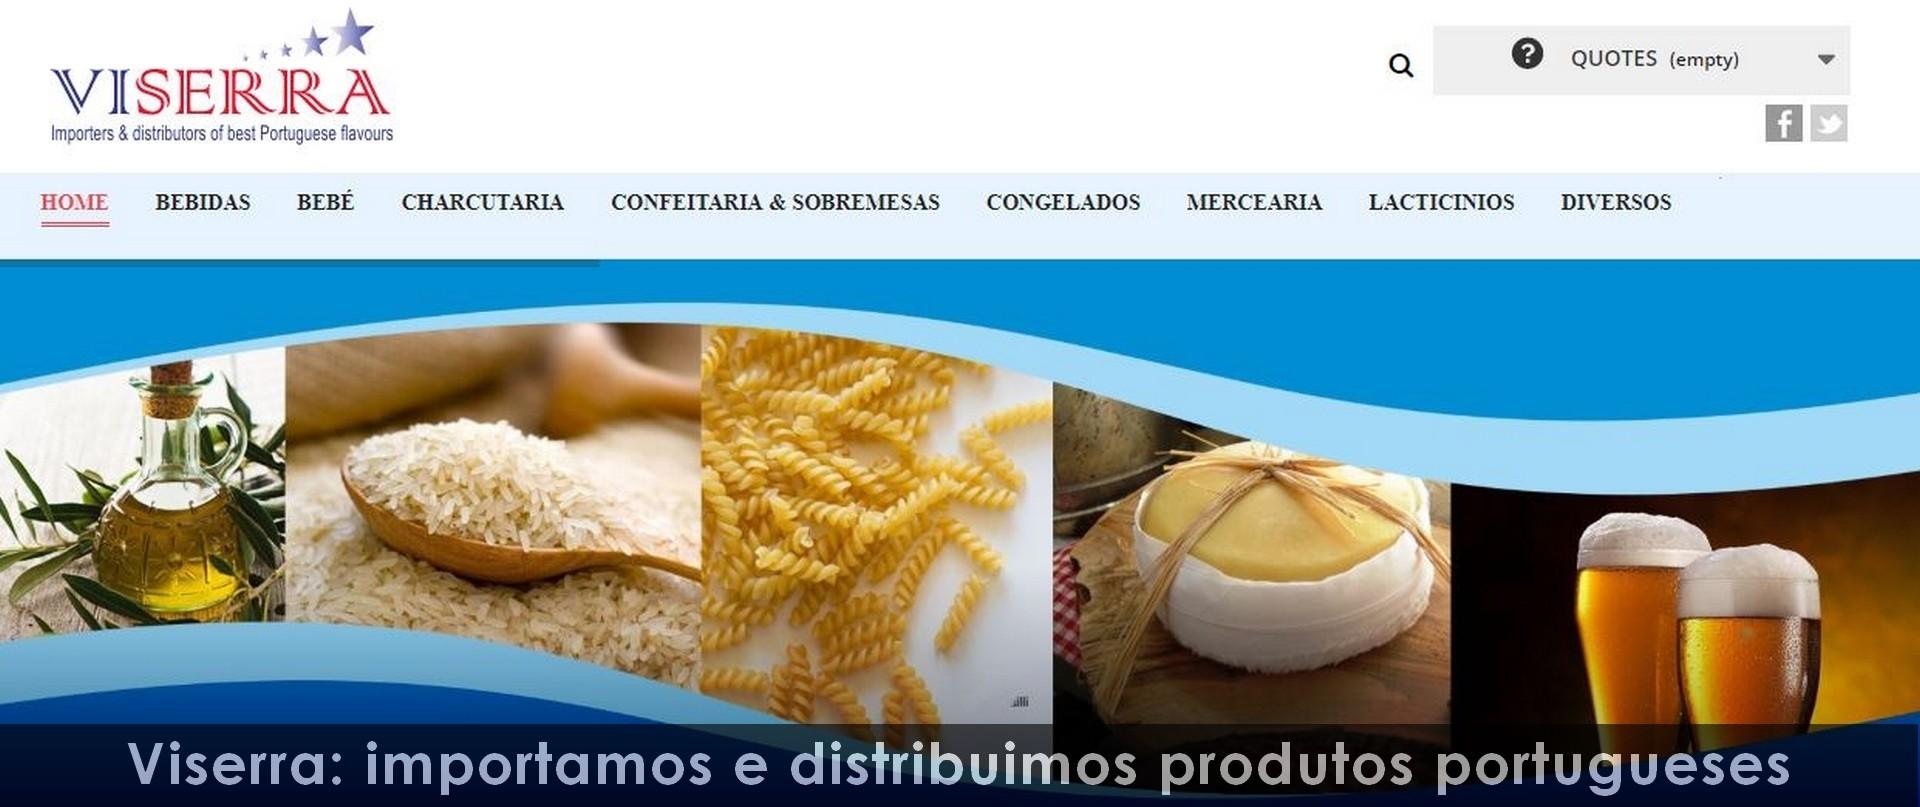 http://cantinhodamadeira.pt/cache/resized/1876d750cc42f124579b9ff7e184ca53.jpg